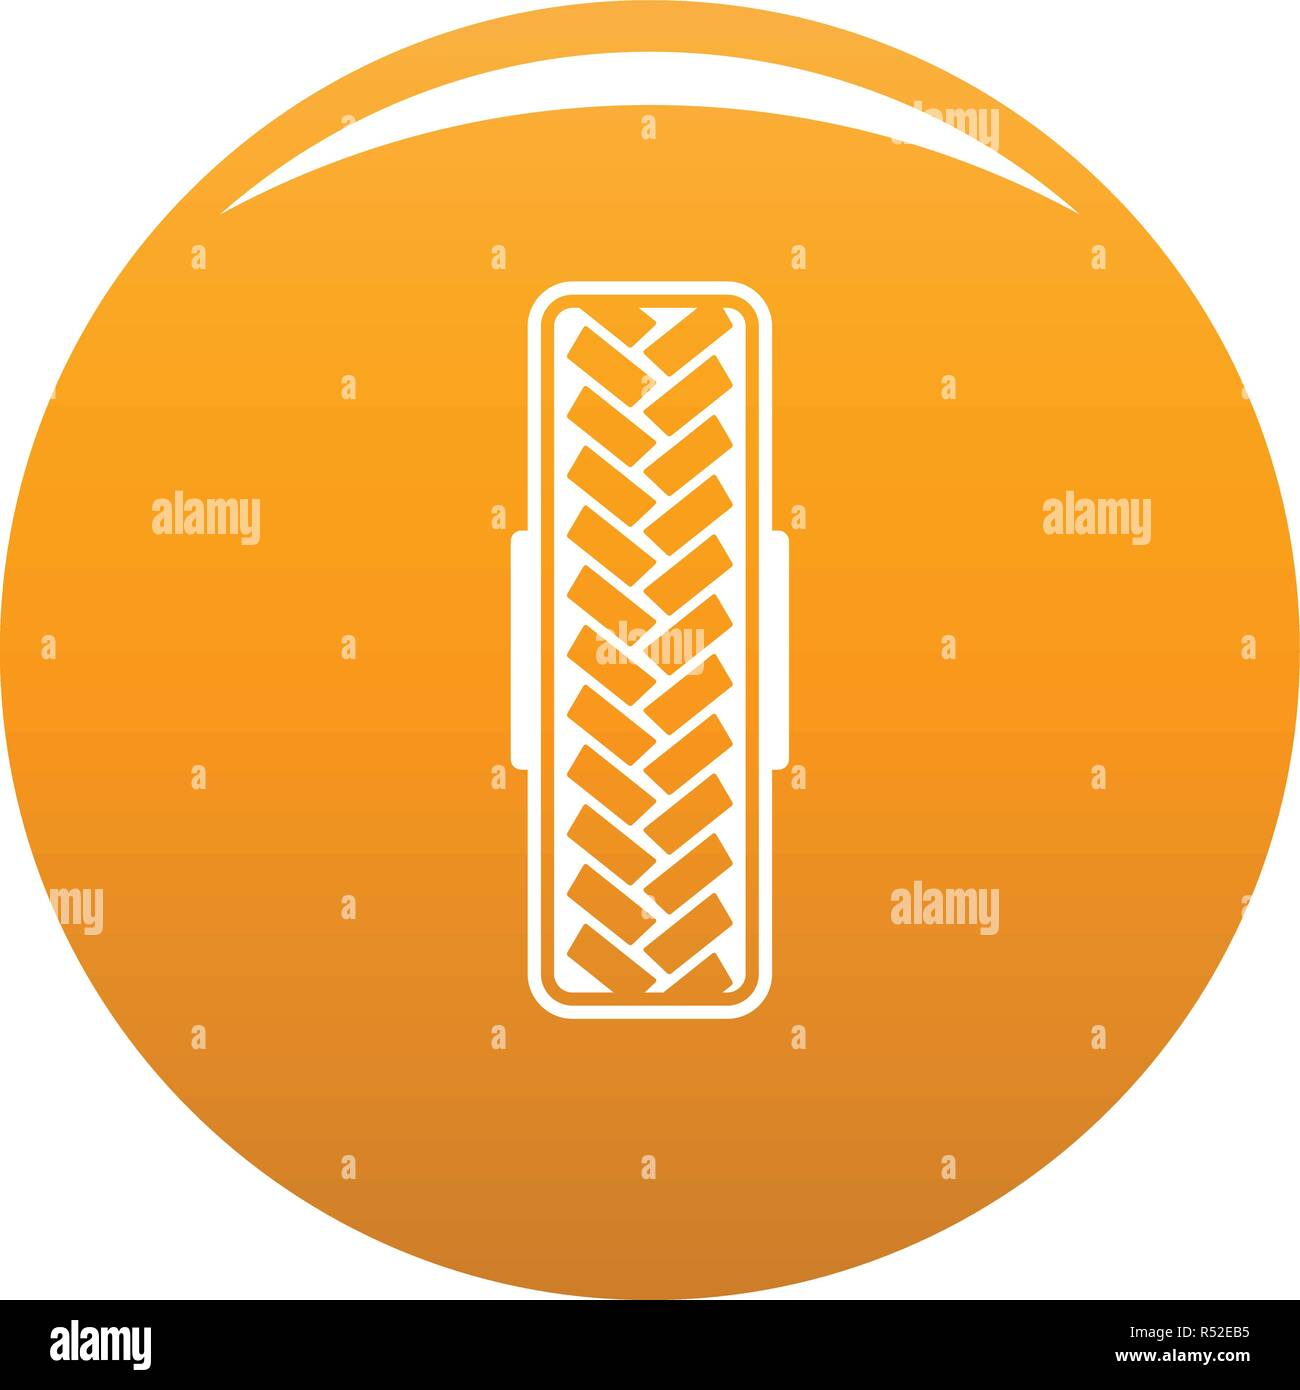 Tread pattern icon. Simple illustration of tread pattern vector icon for any design orange - Stock Vector